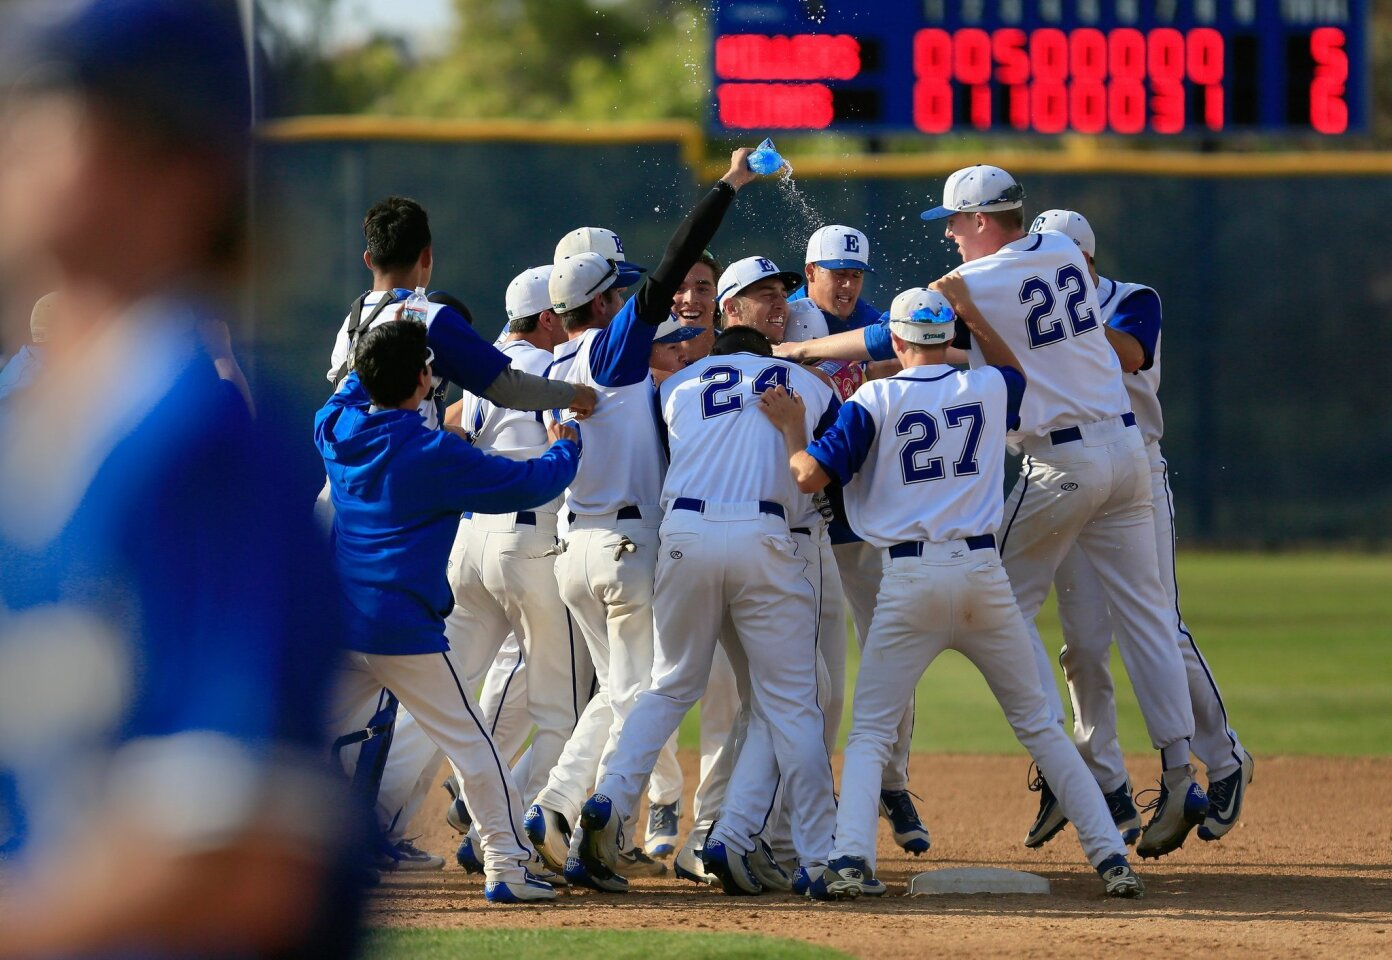 Eastlake vs Grossmont High School playoffs 05/25/2016